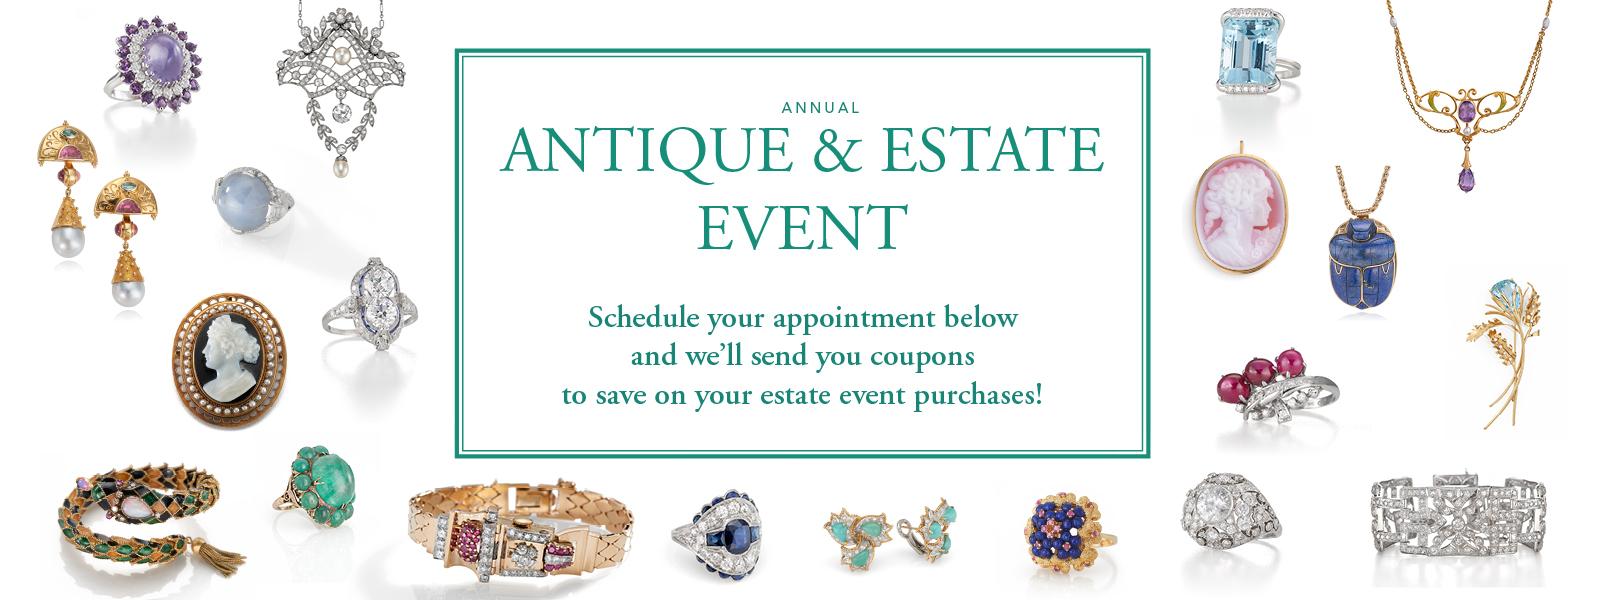 Antique Estate Event at Dickinson Jewelers